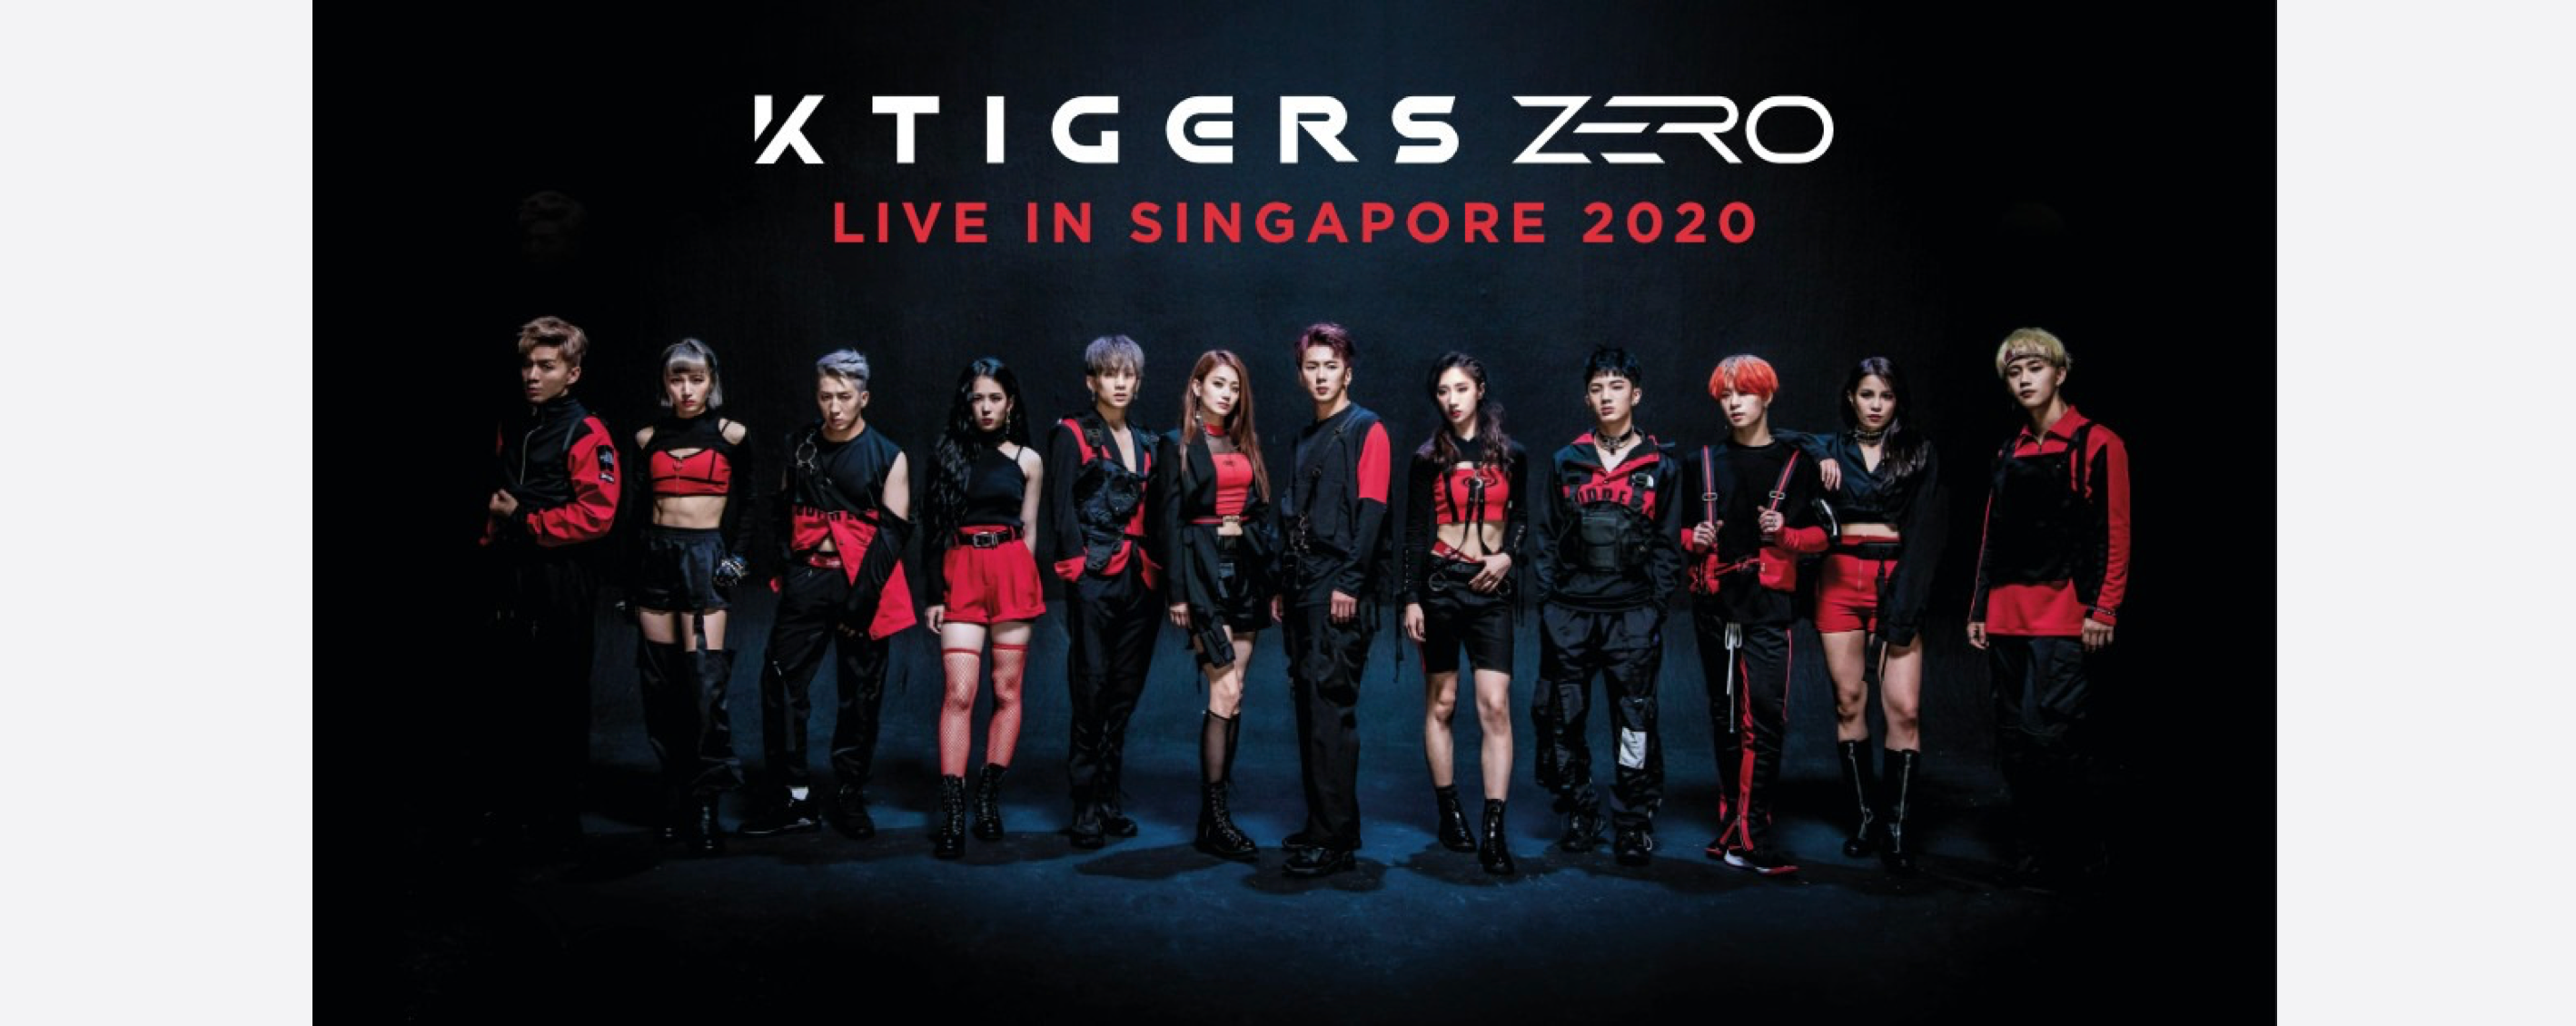 [POSTPONED] K-Tigers Zero - Live in Singapore 2020